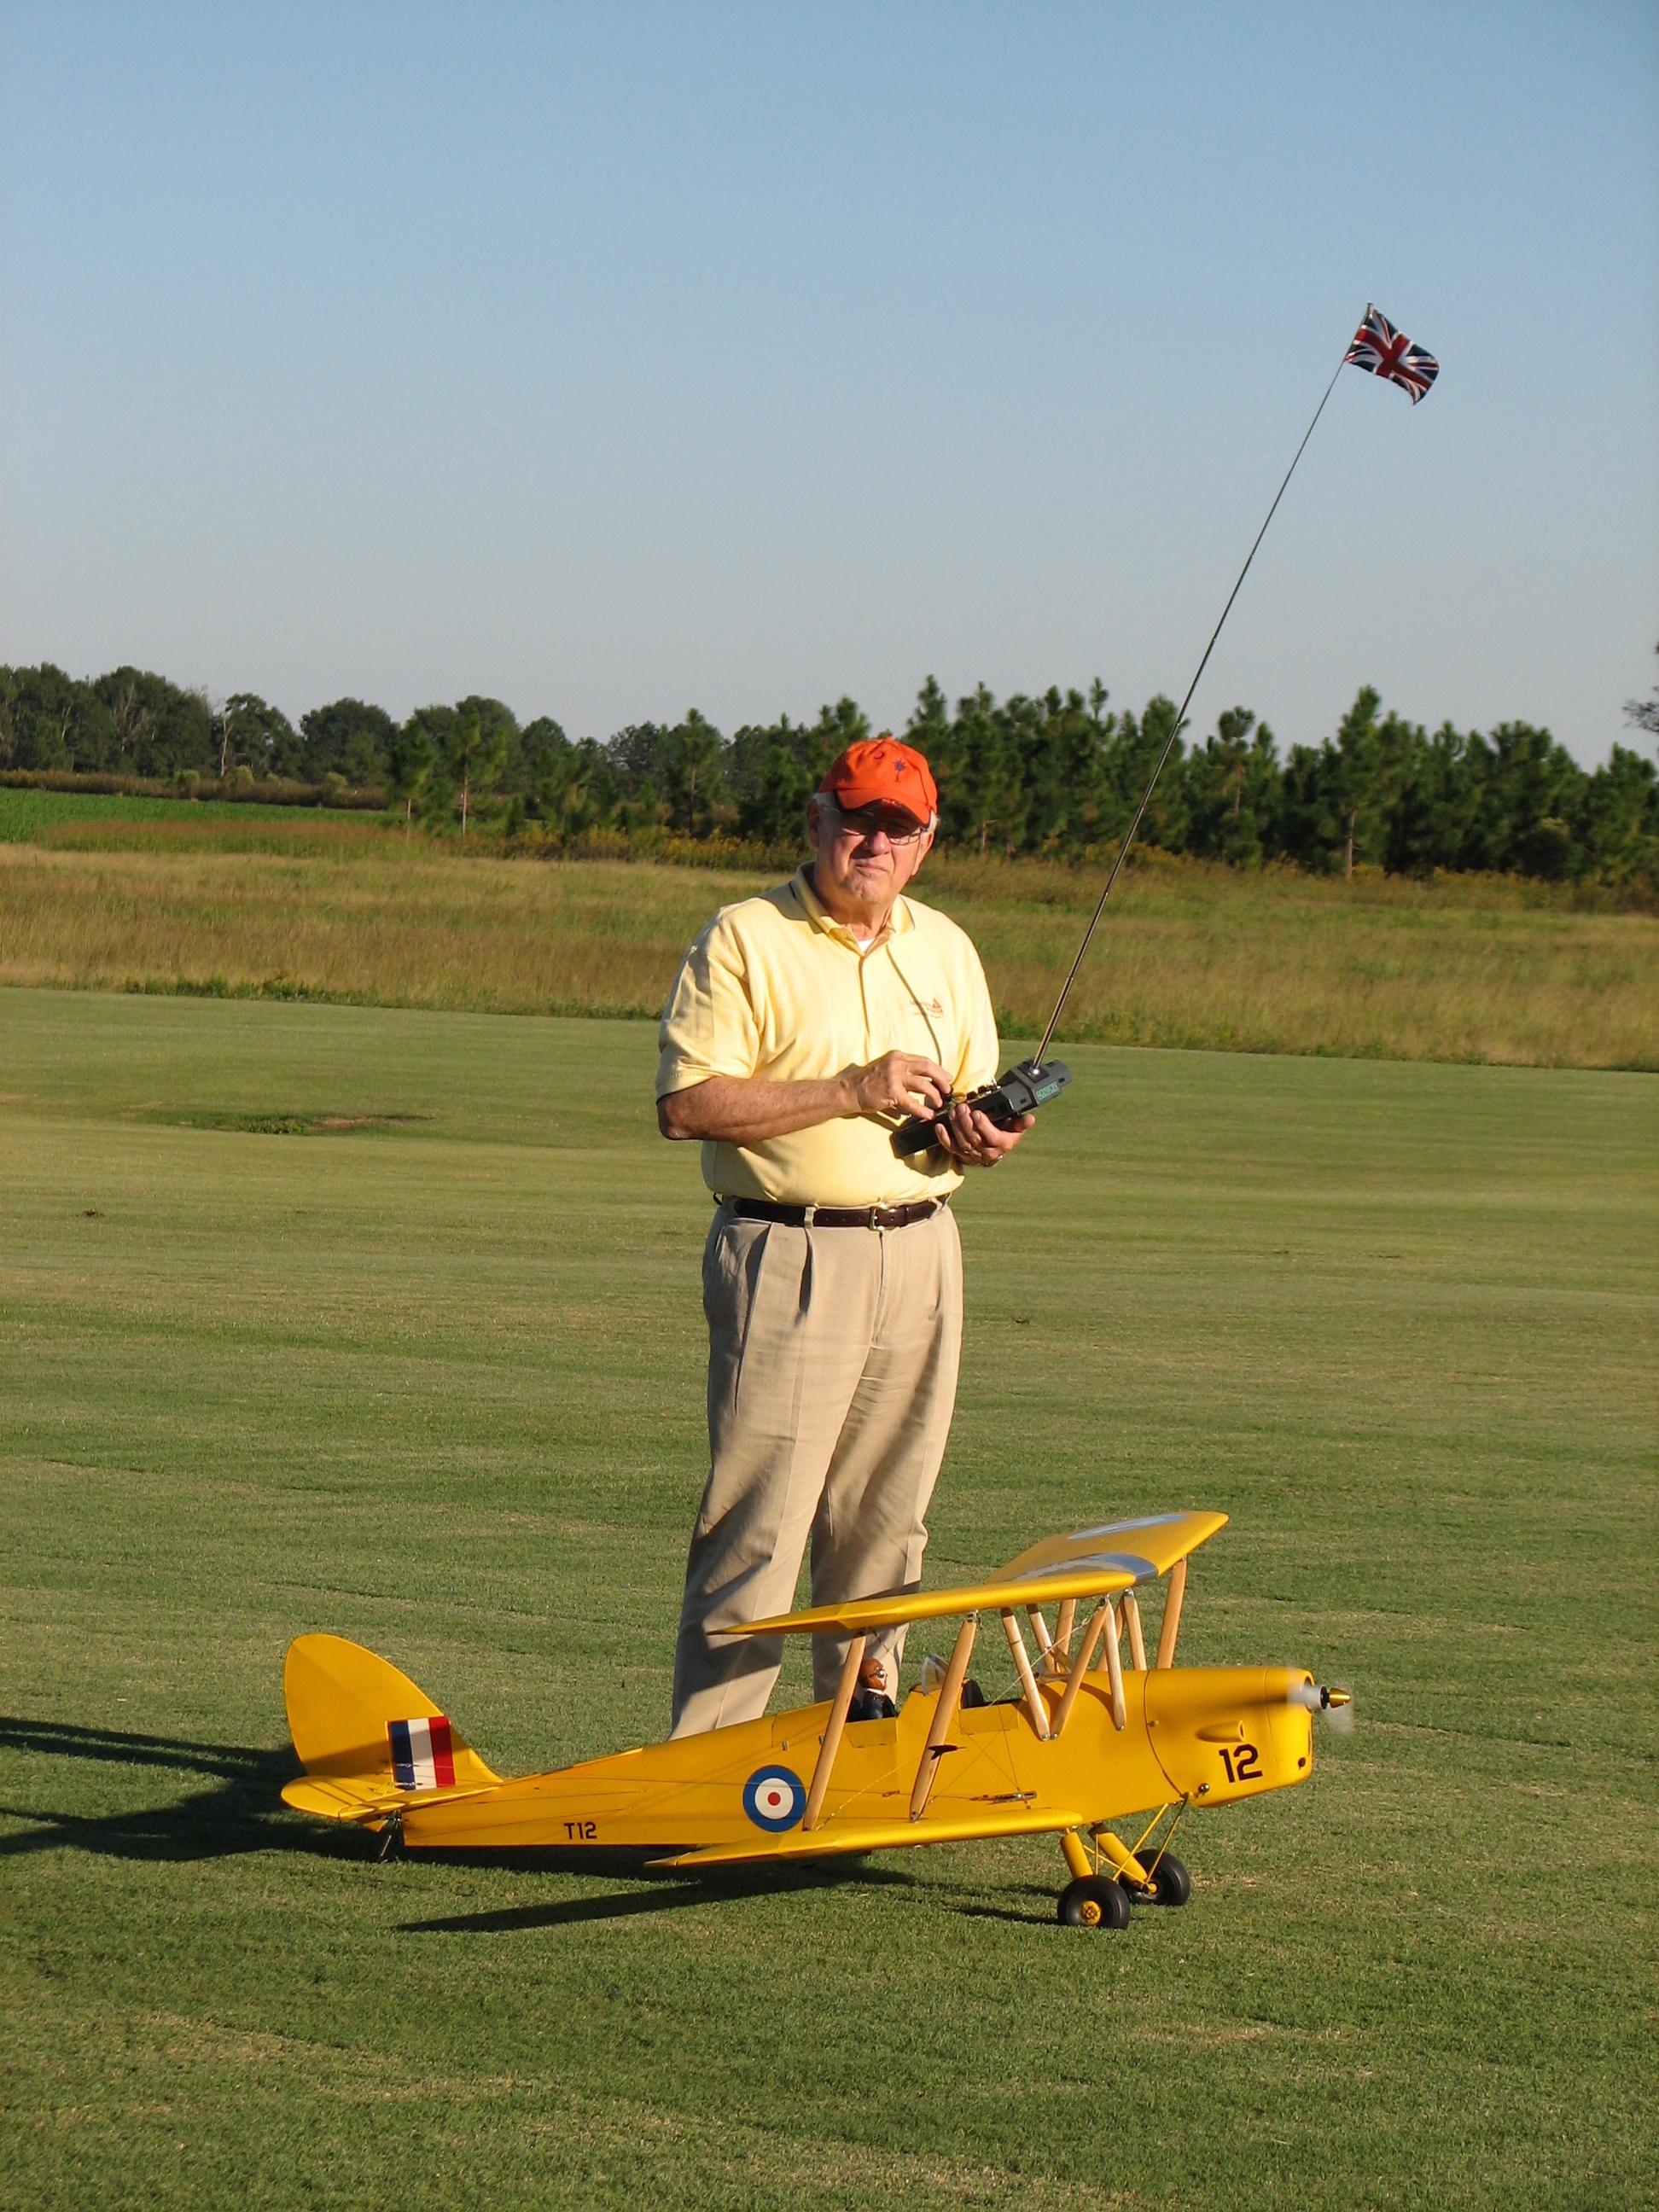 Click image for larger version.  Name:Tiger Moth at Macks.jpg Views:14 Size:2.19 MB ID:2028855